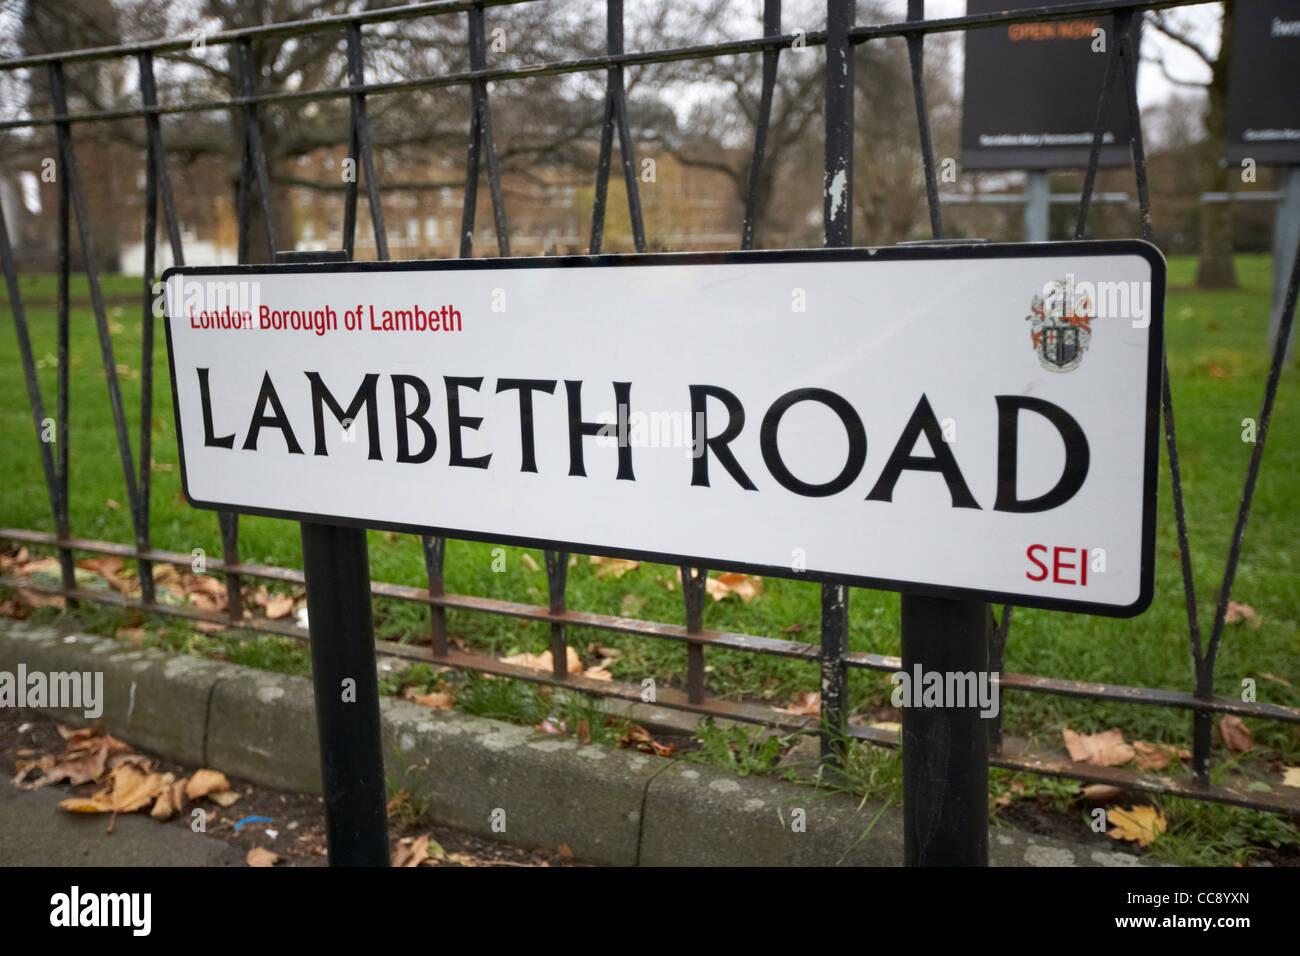 street sign for lambeth road London England UK United kingdom - Stock Image